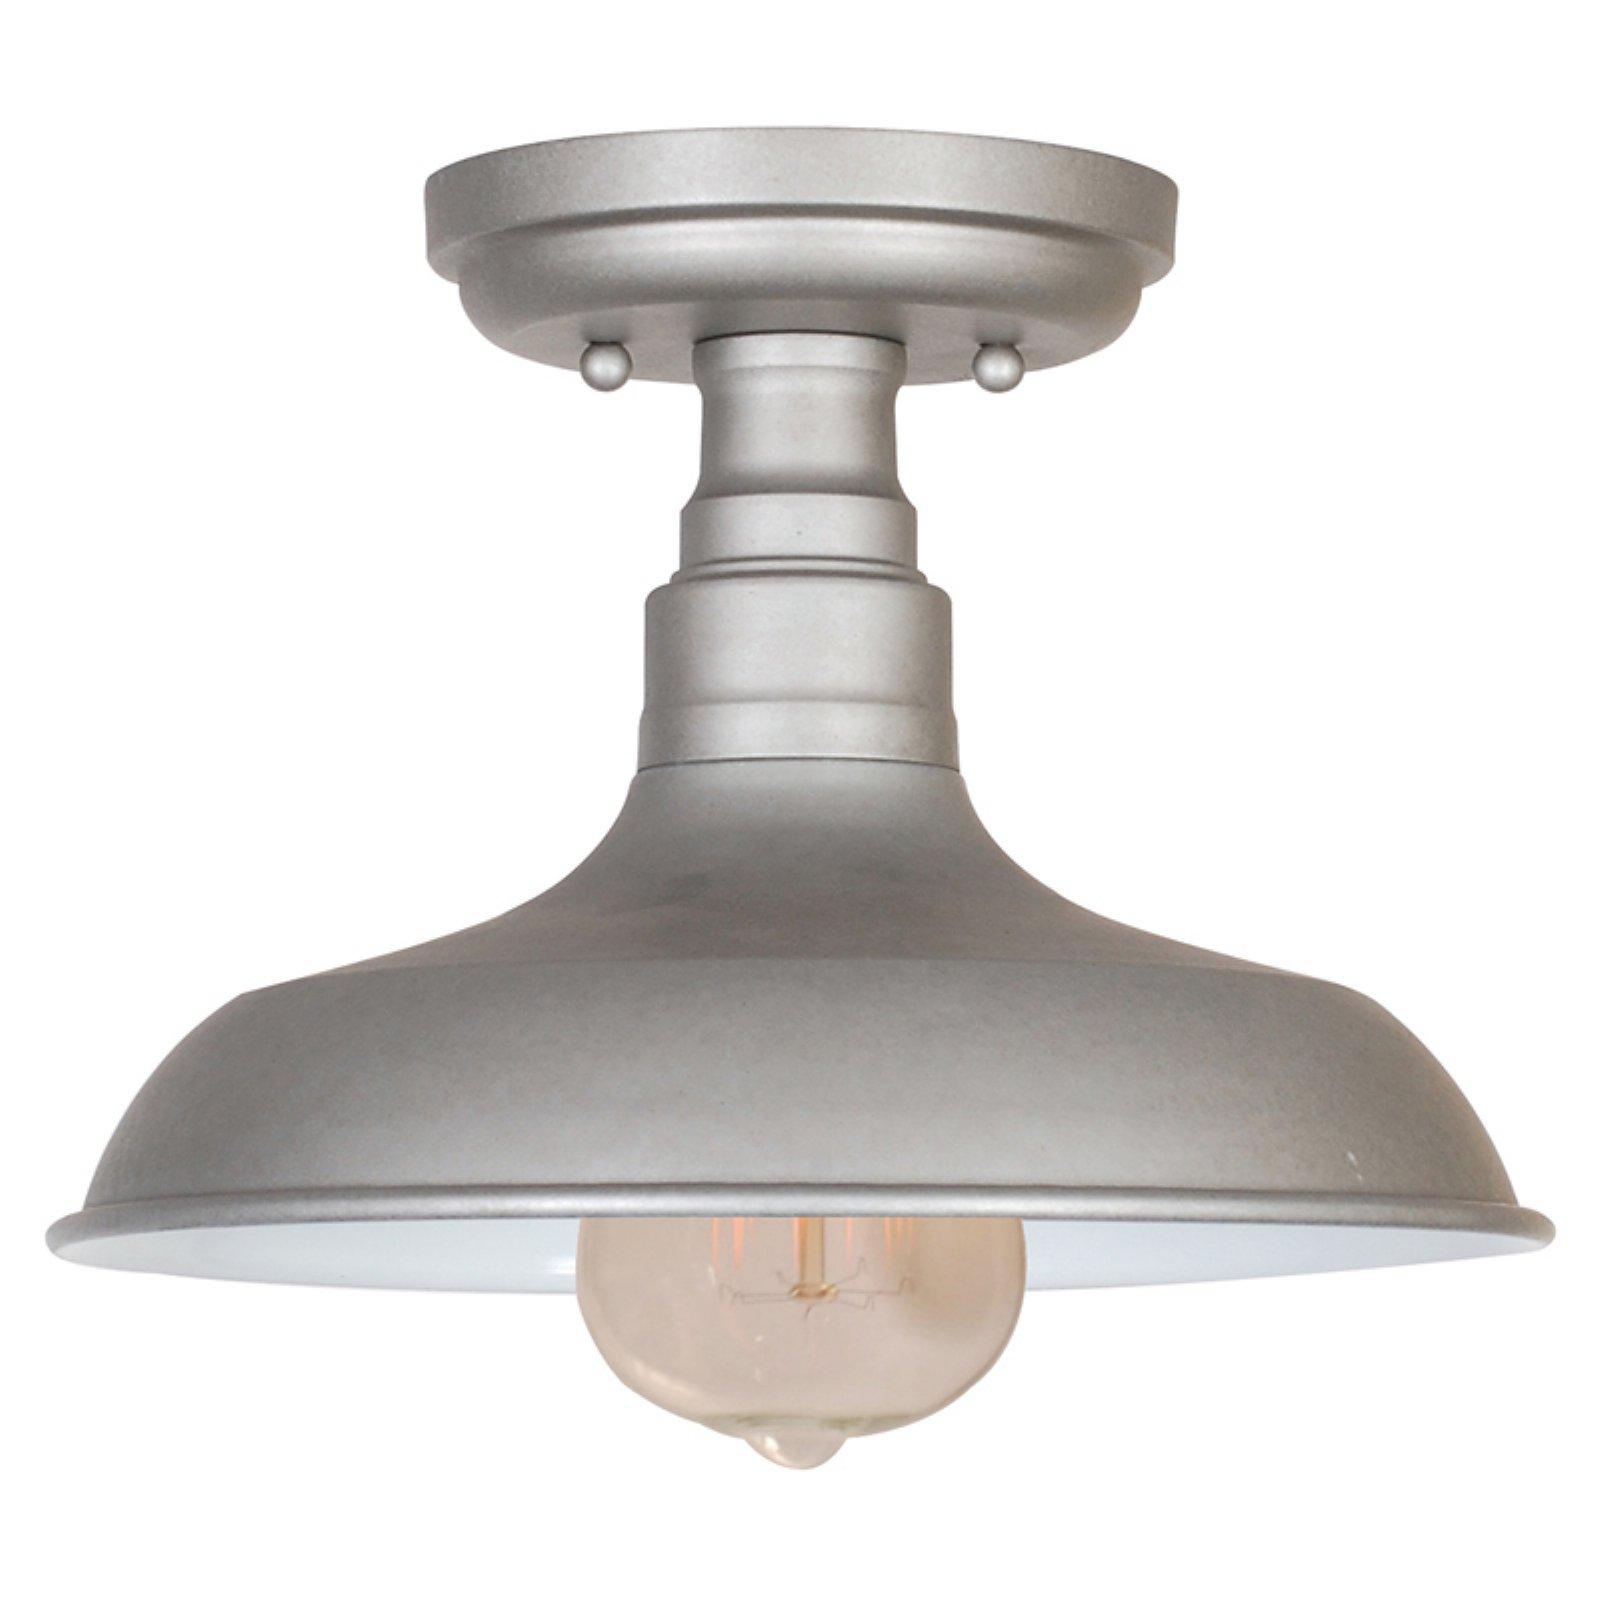 Design House 519876 Kimball 1-Light Ceiling Mount Industrial Light, Galvanized Steel